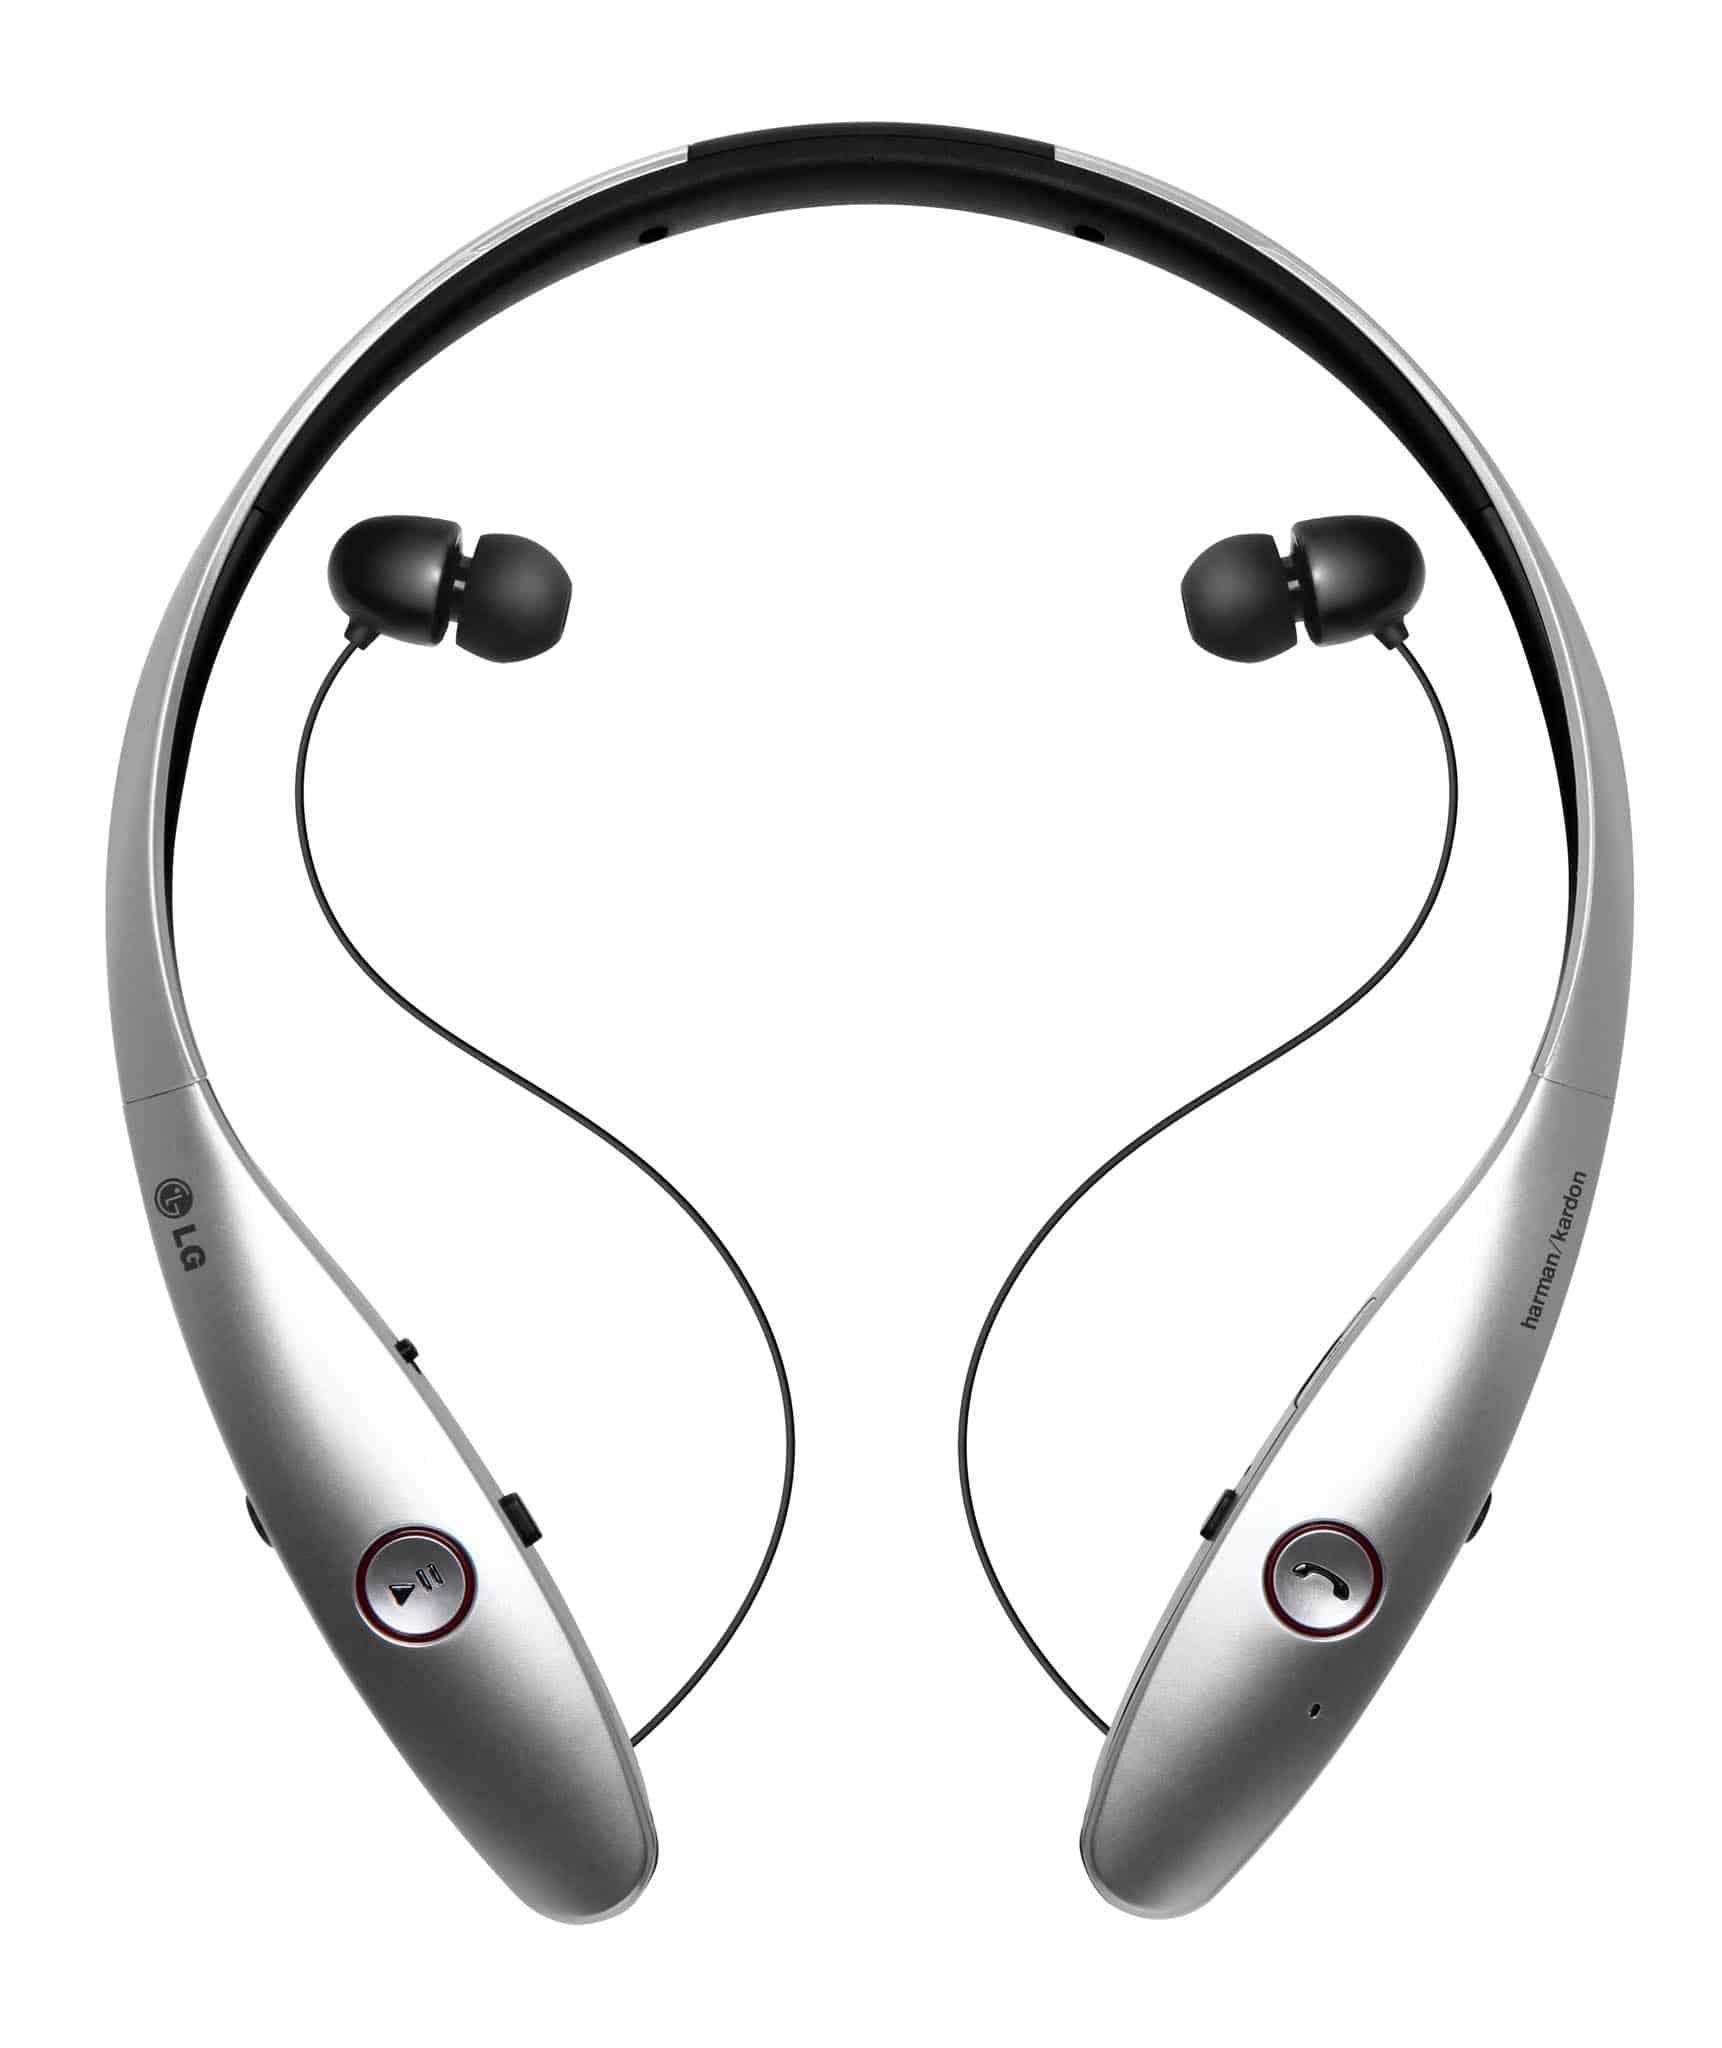 Lg Partners With Harman Kardon For New Bluetooth Headset